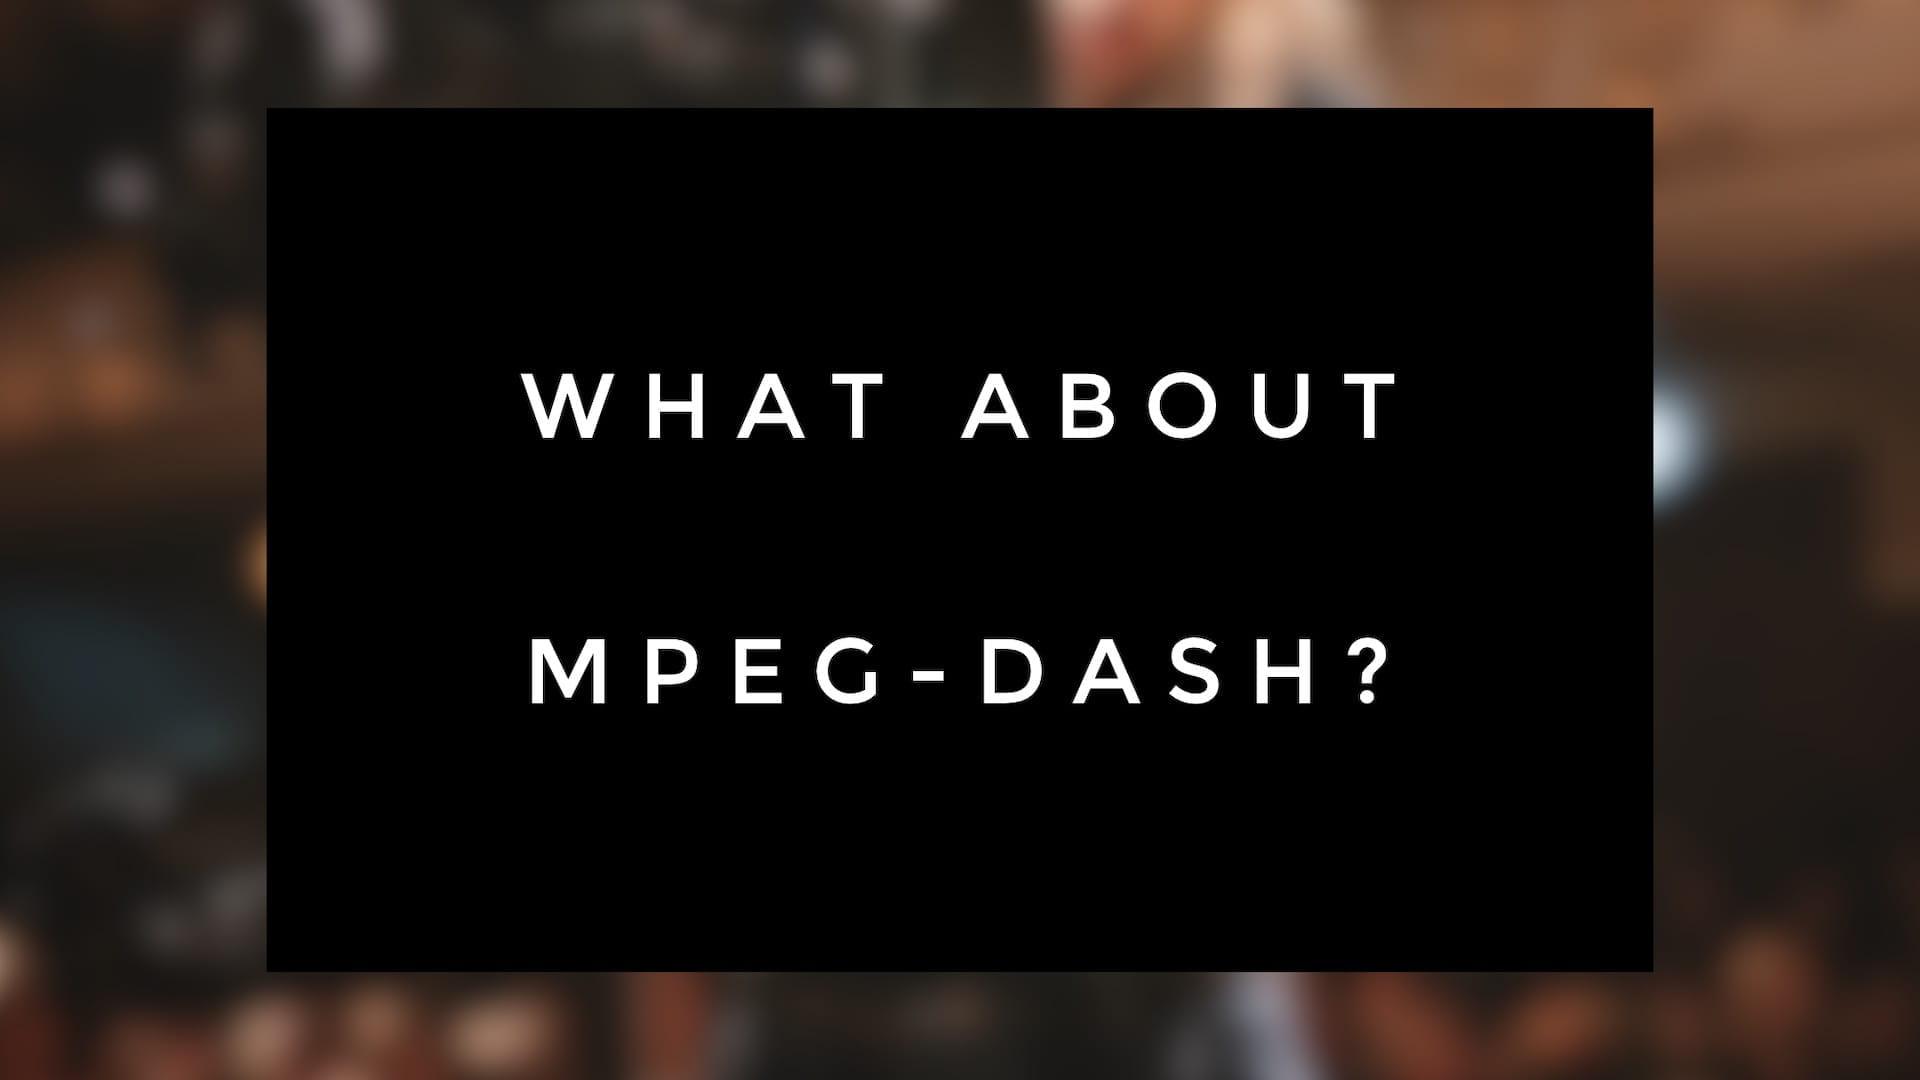 MPEG-DASH(Dynamic Adaptive Streaming Over HTTP)について解説します [ Wowza Blog 翻訳 ]